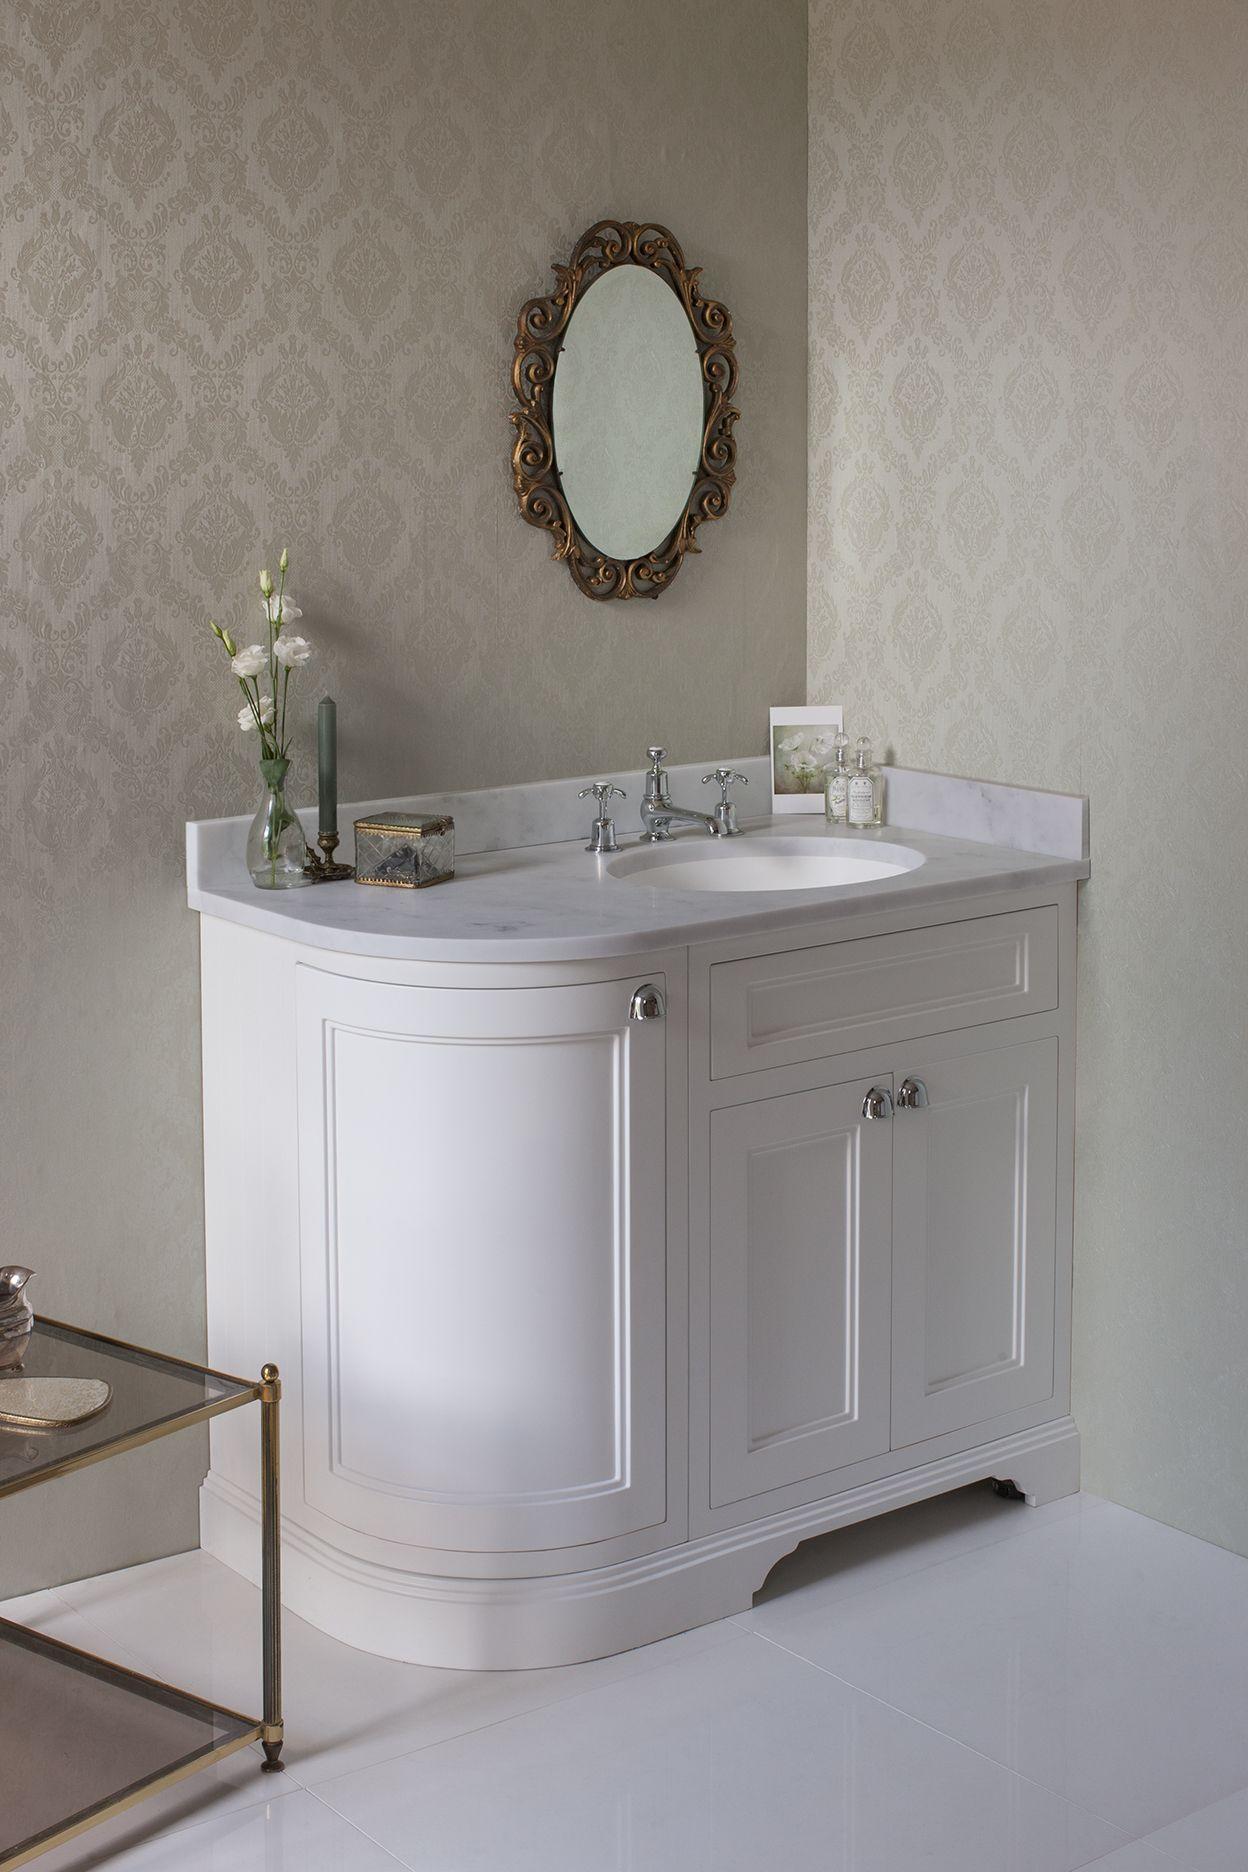 Freestanding 100 Rh Curved Corner Unit With Carrara White Worktop And Integrated White Basin Matt White Sku Fc3w Bc98r Cheap Bathroom Vanities Corner Vanity Unit Traditional Bathroom